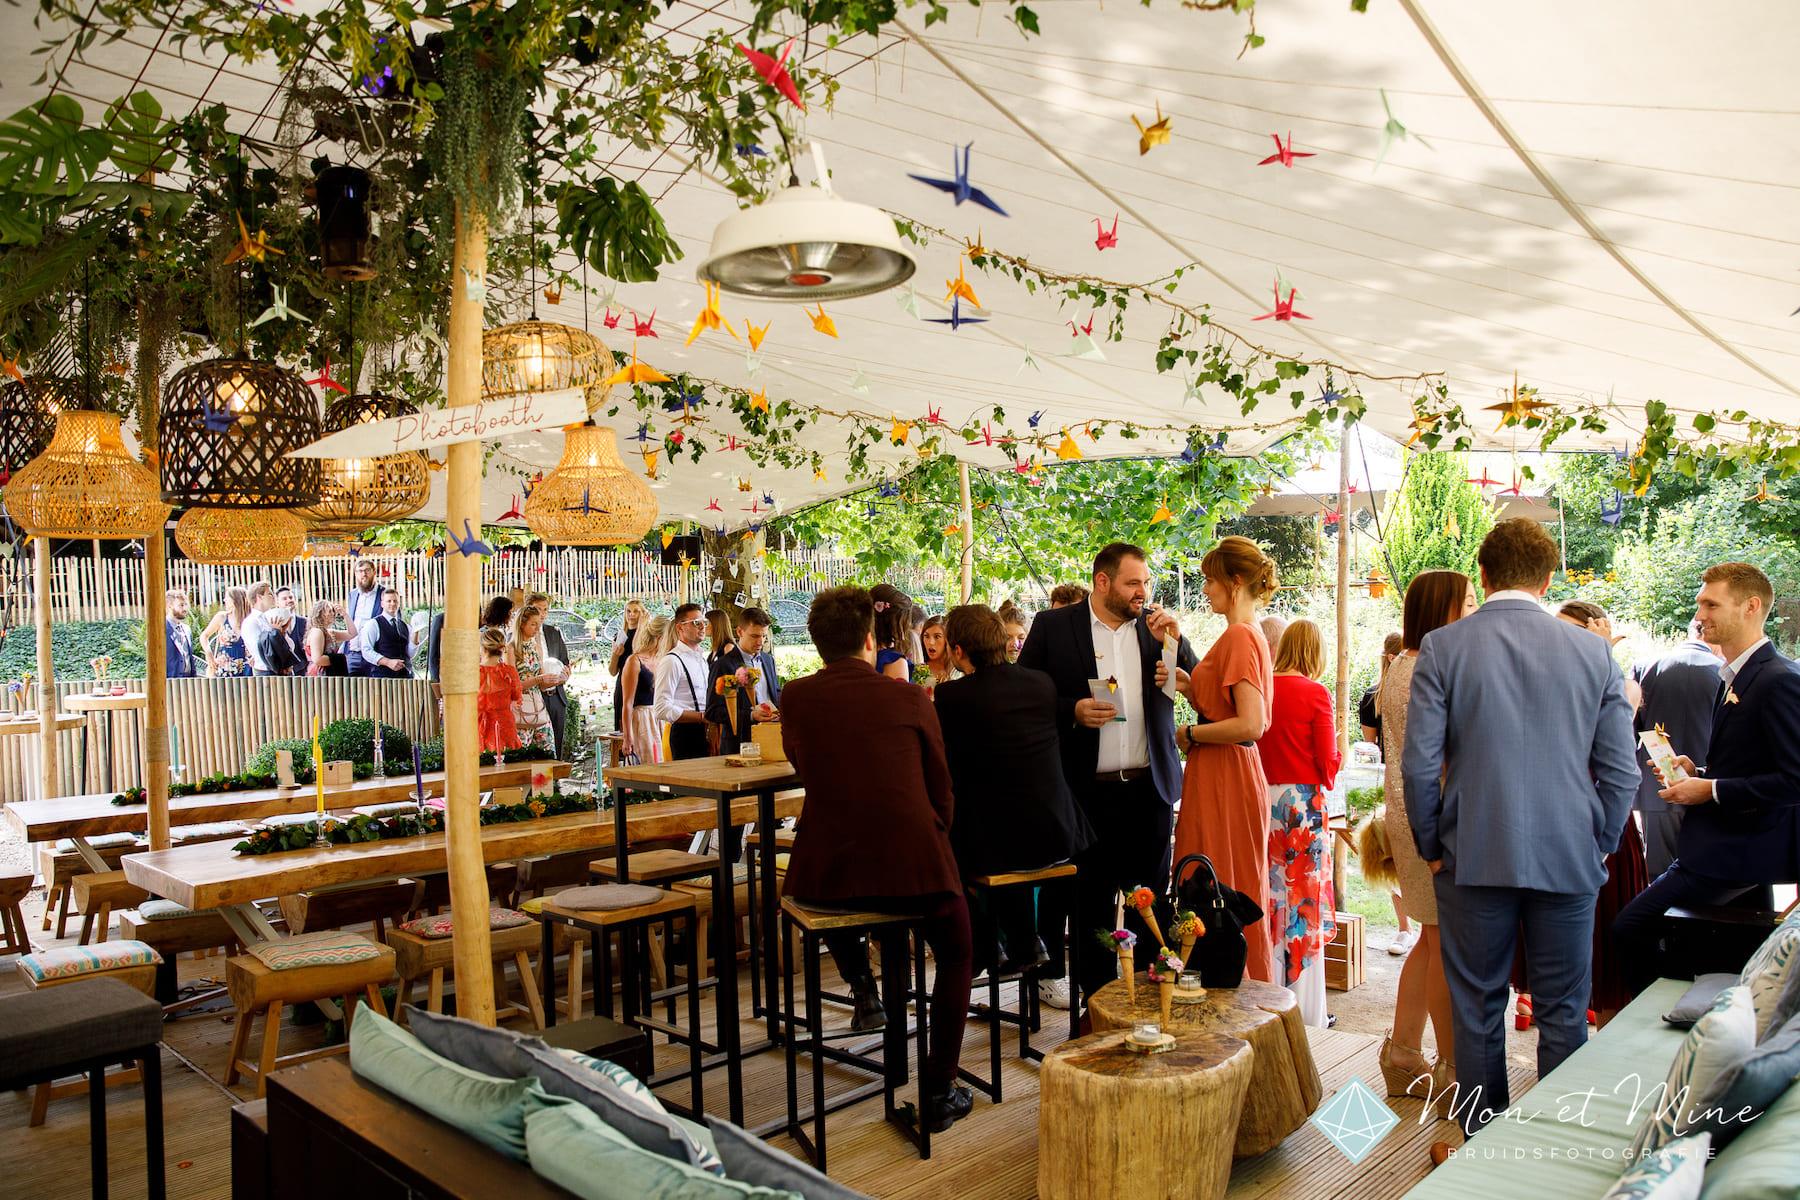 Park Ven bar feest lounge wine Diepenbeek drinken